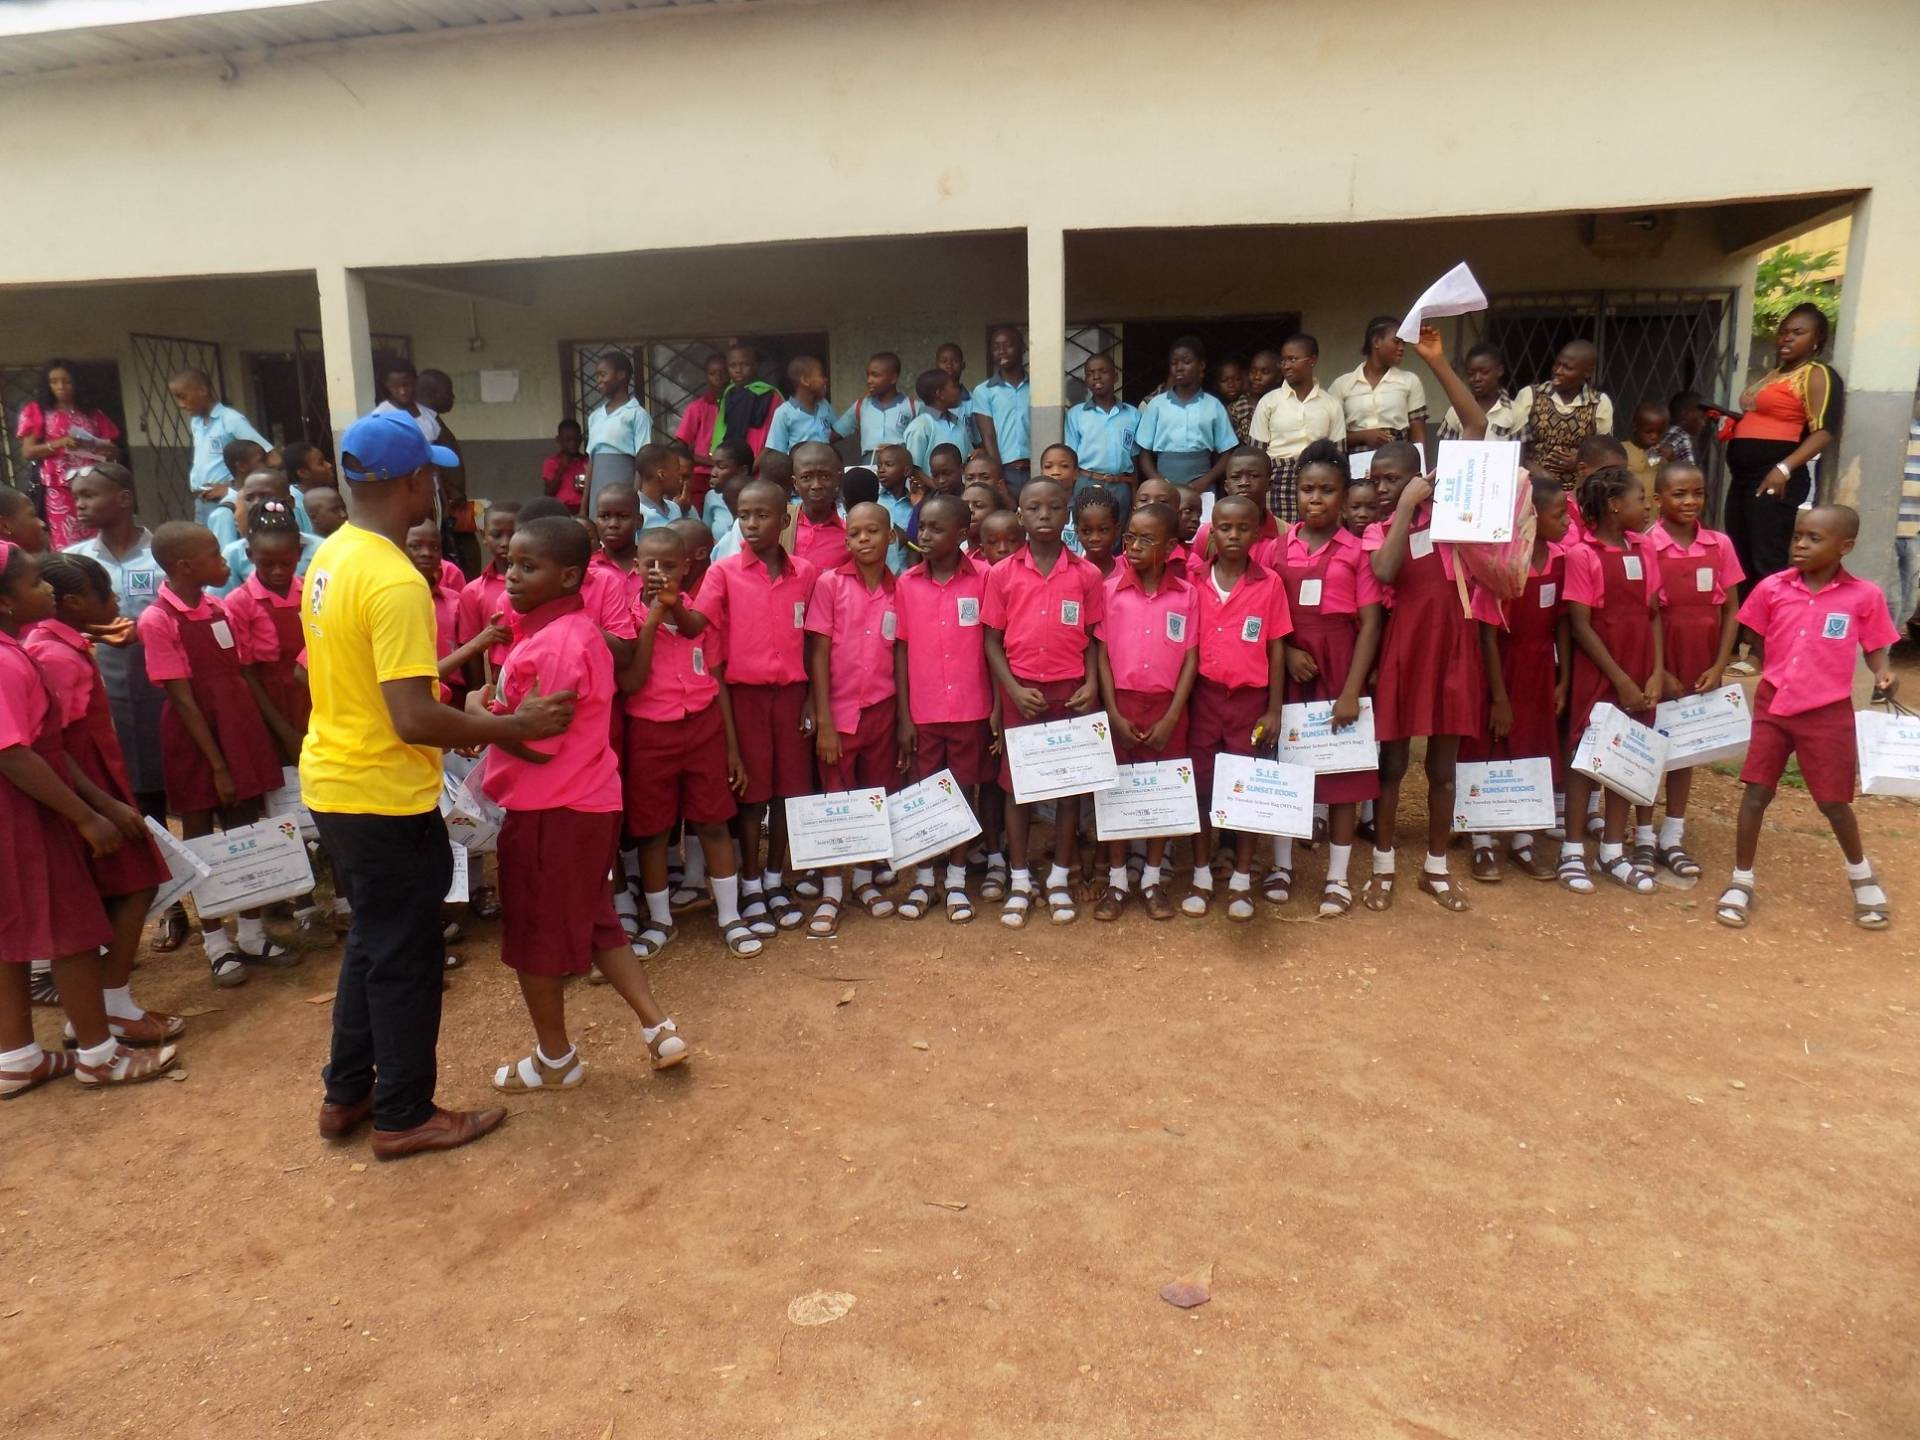 Helpers Social Development Foundation